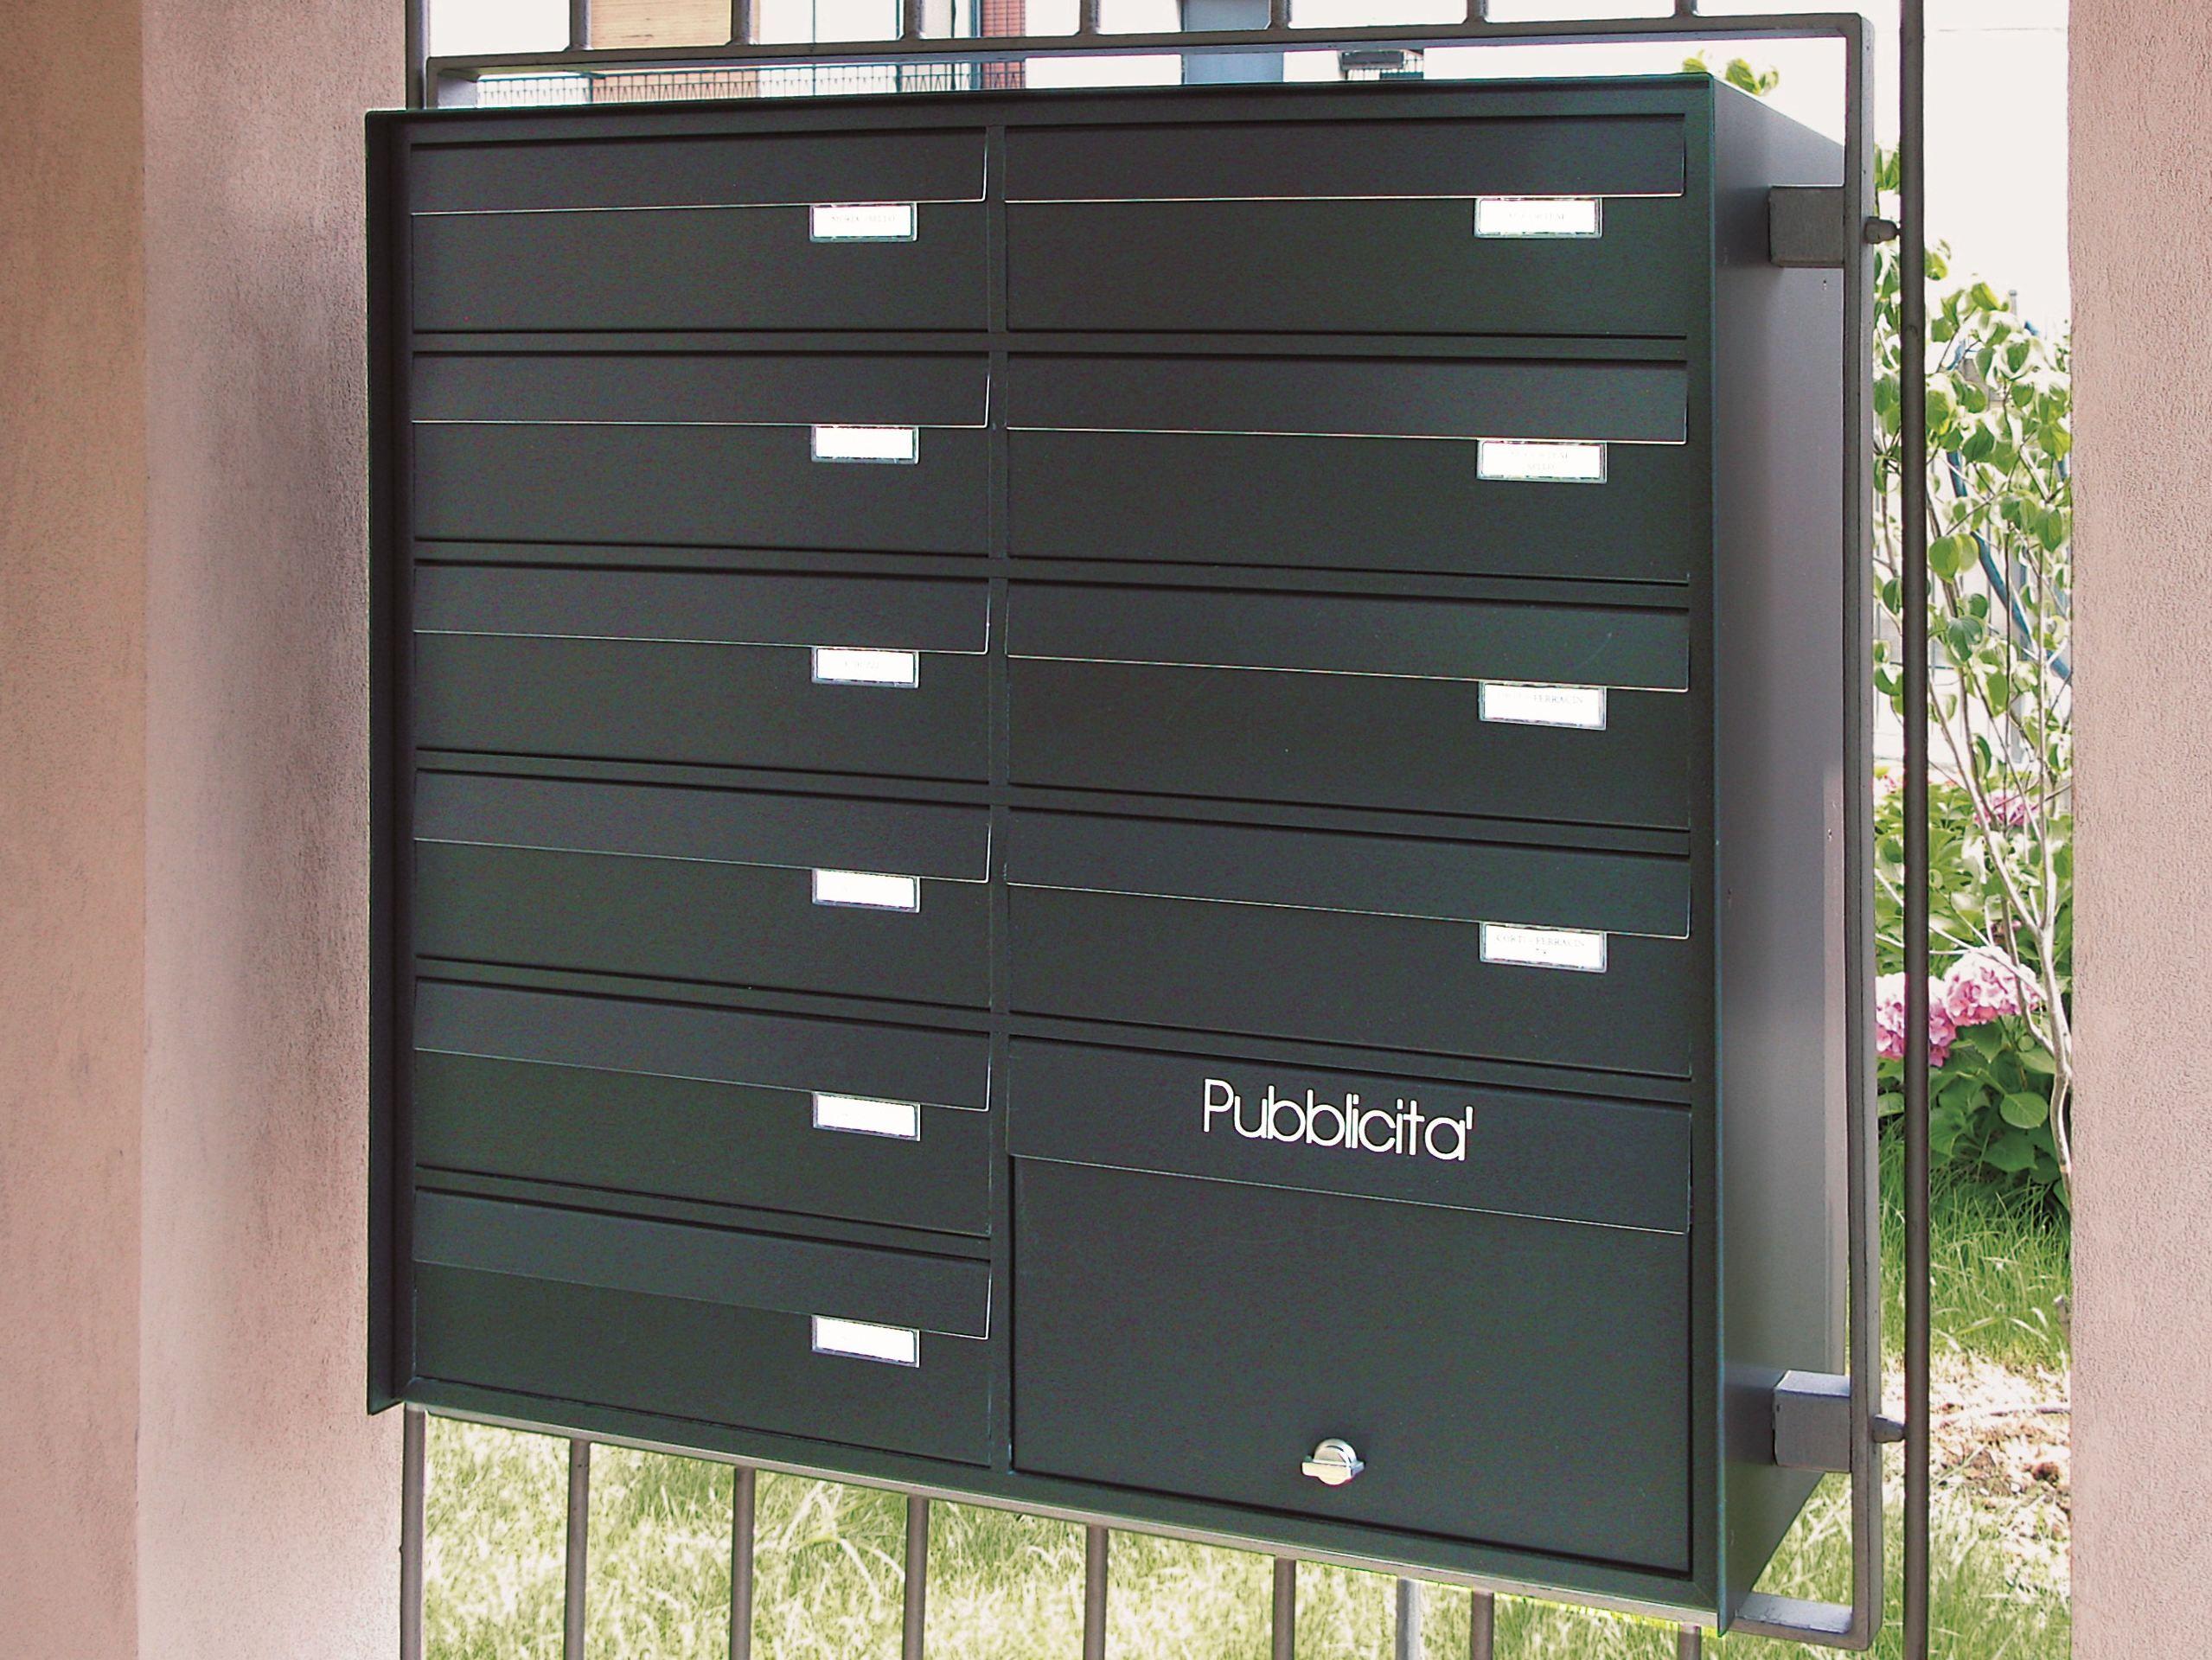 Df cassetta postale by ravasi - Cassetta postale design ...